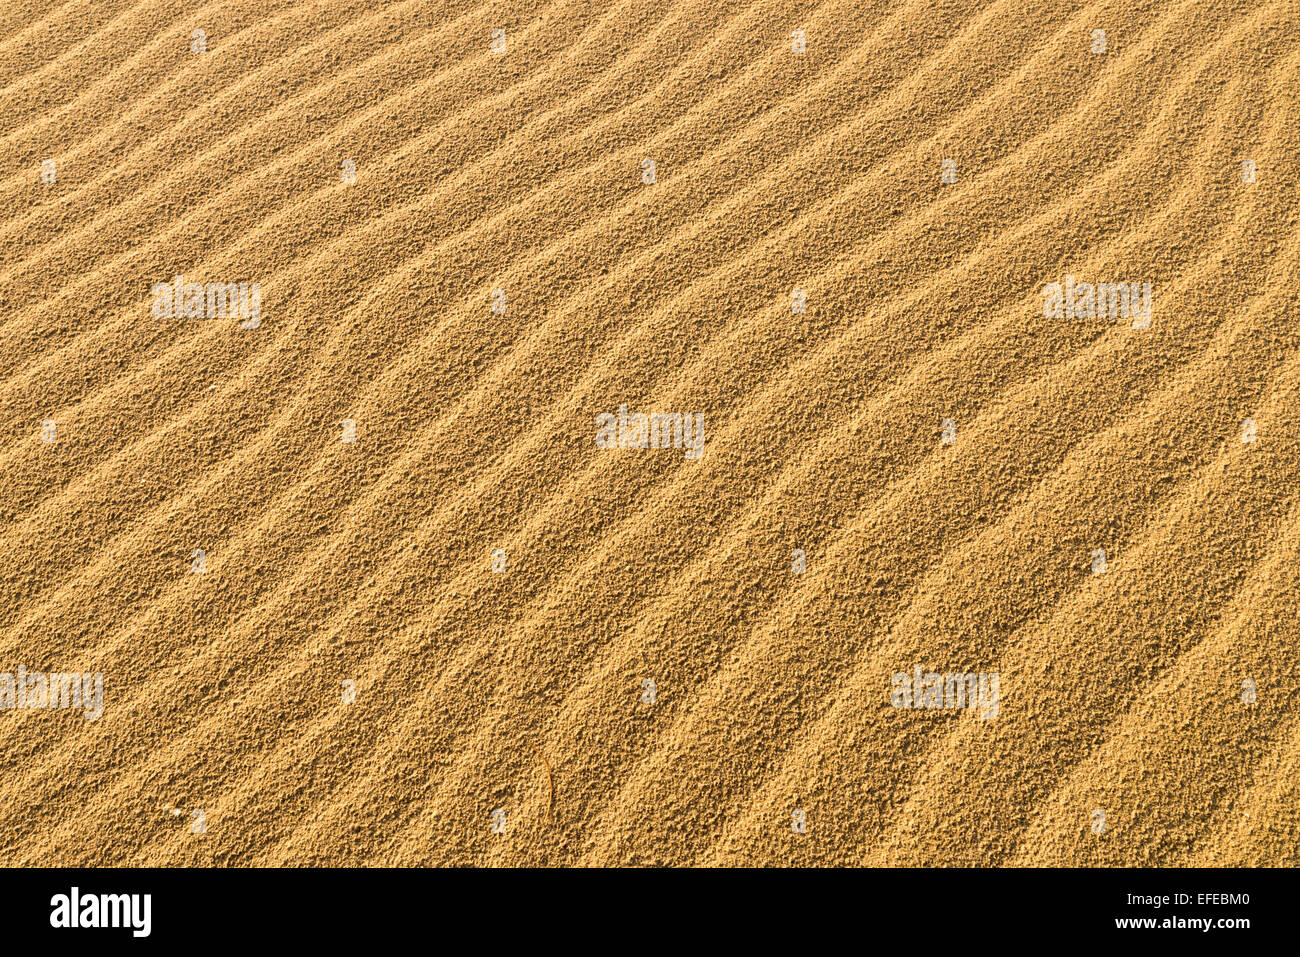 Full Frame Take Sand Background Stock Photos & Full Frame Take Sand ...